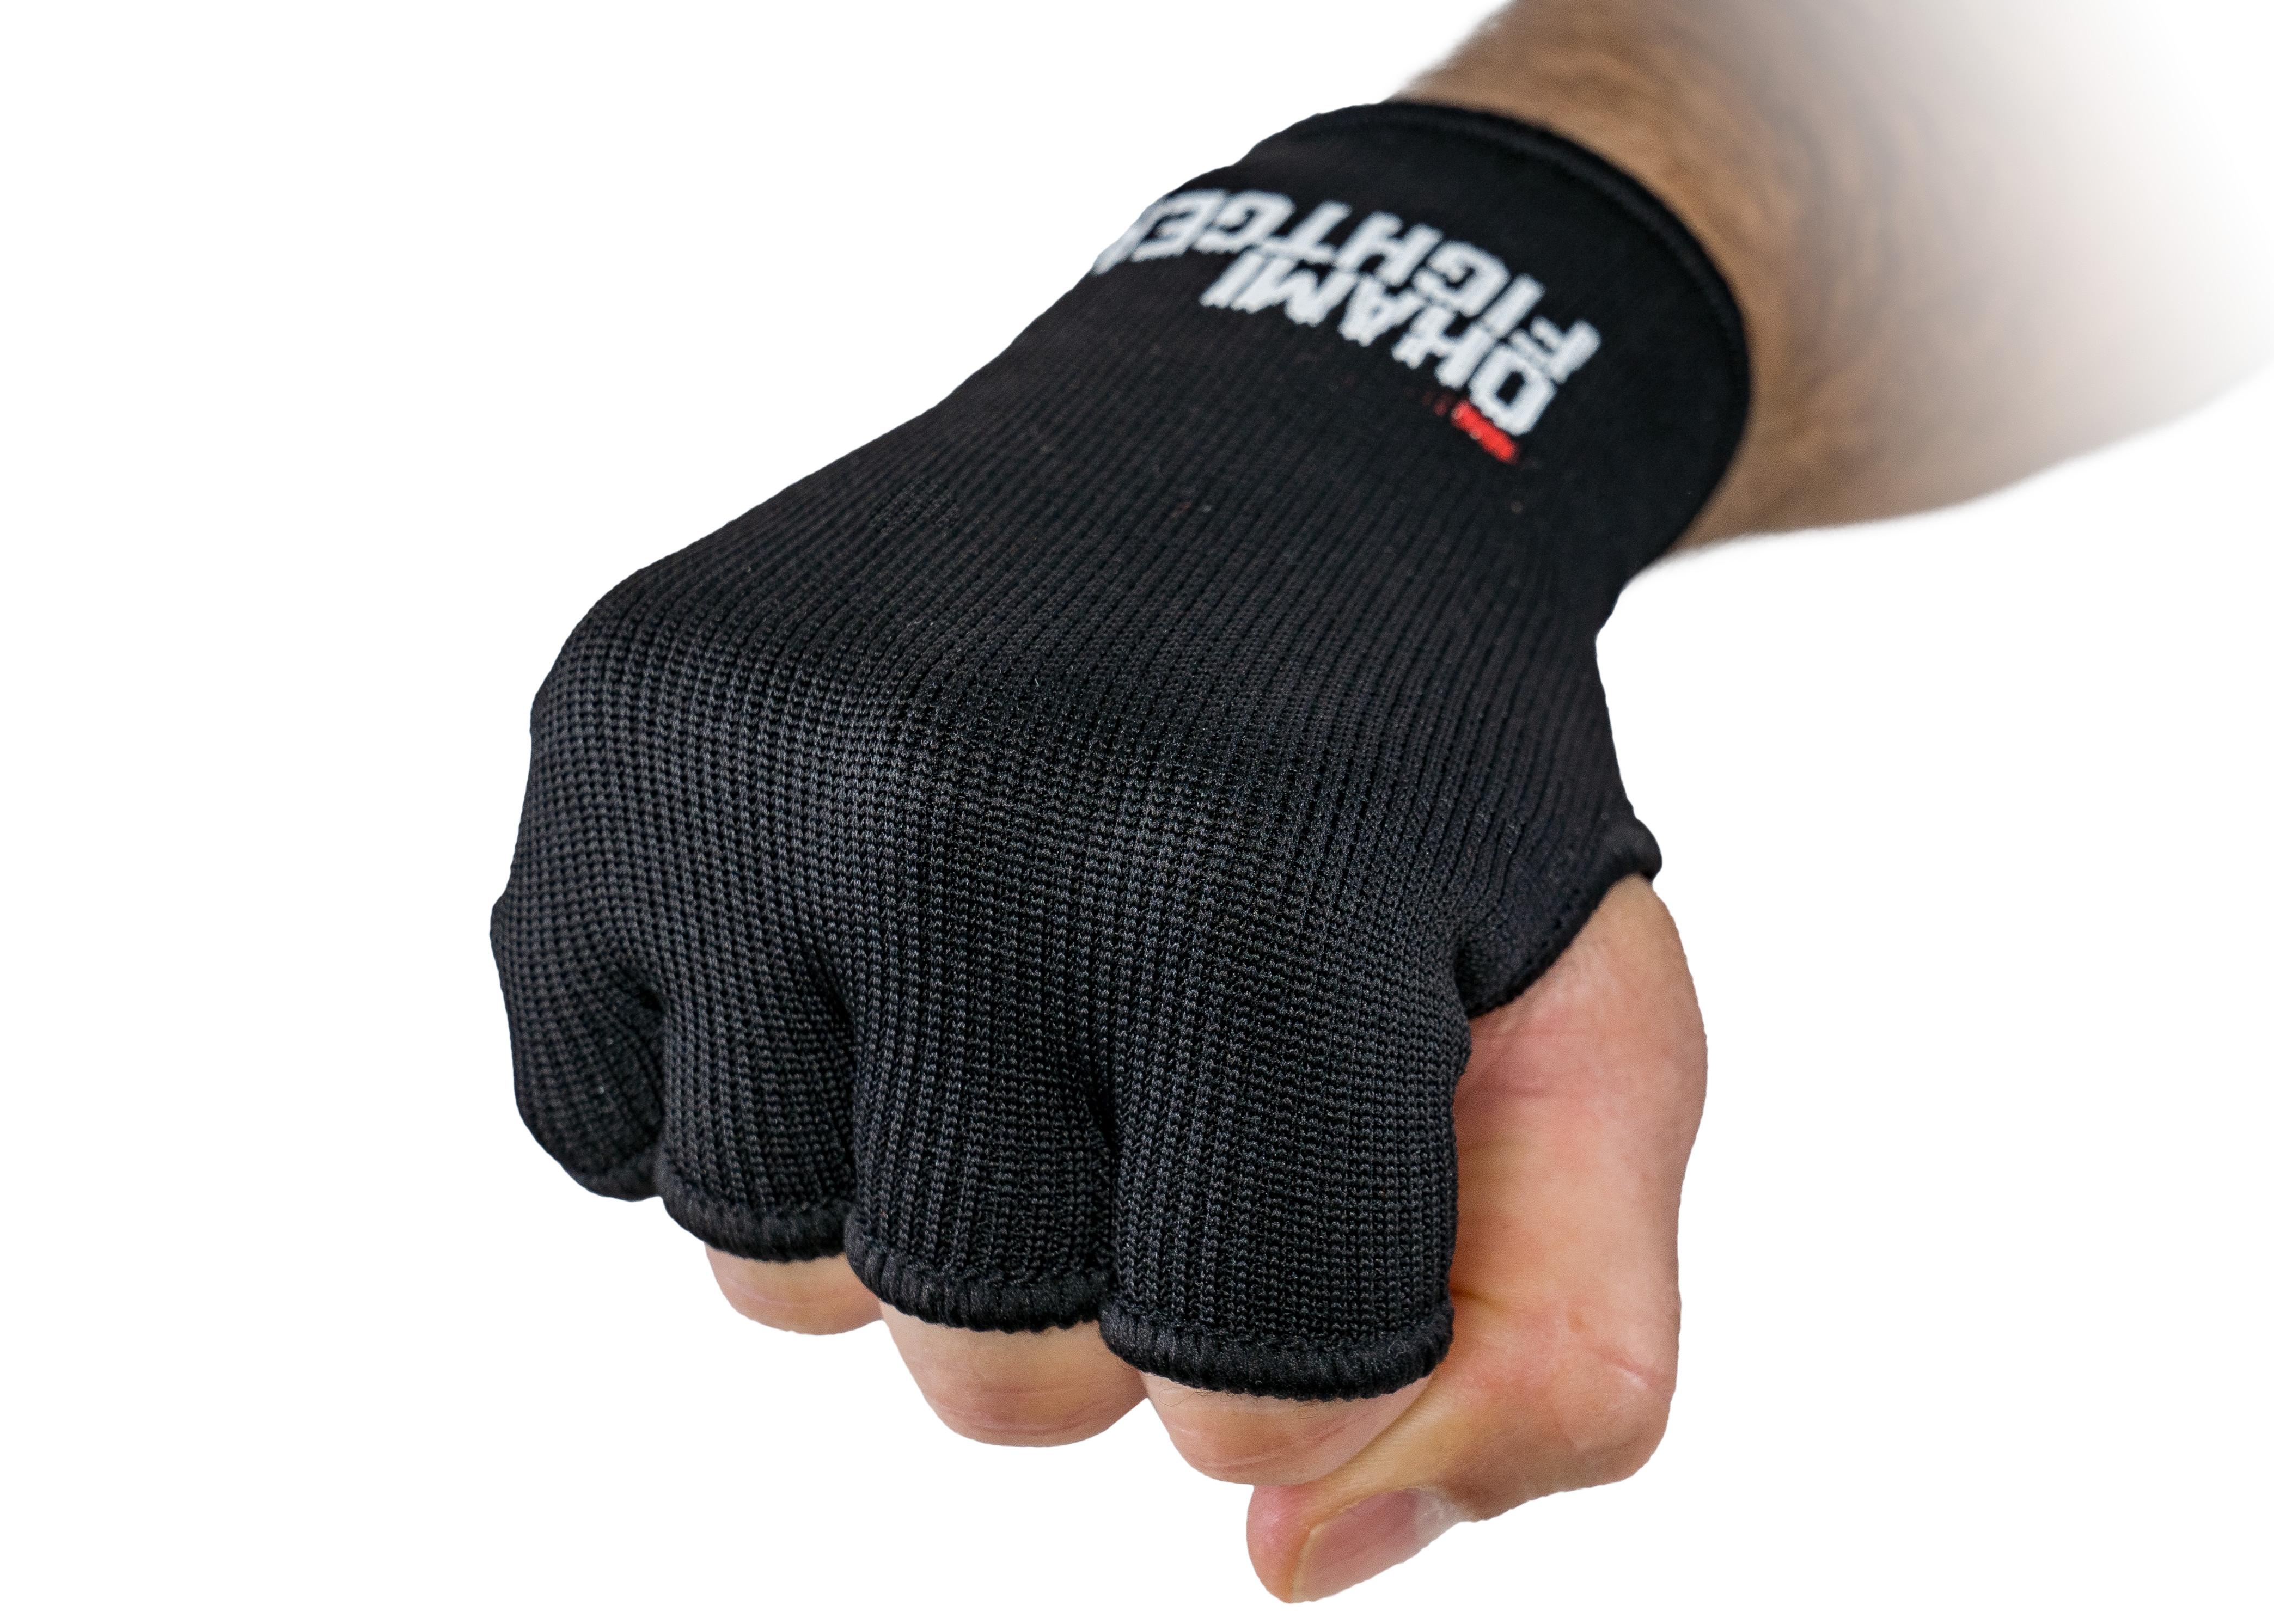 Okami Fightgear Unterhandschuh  (Größe M) (Paar)